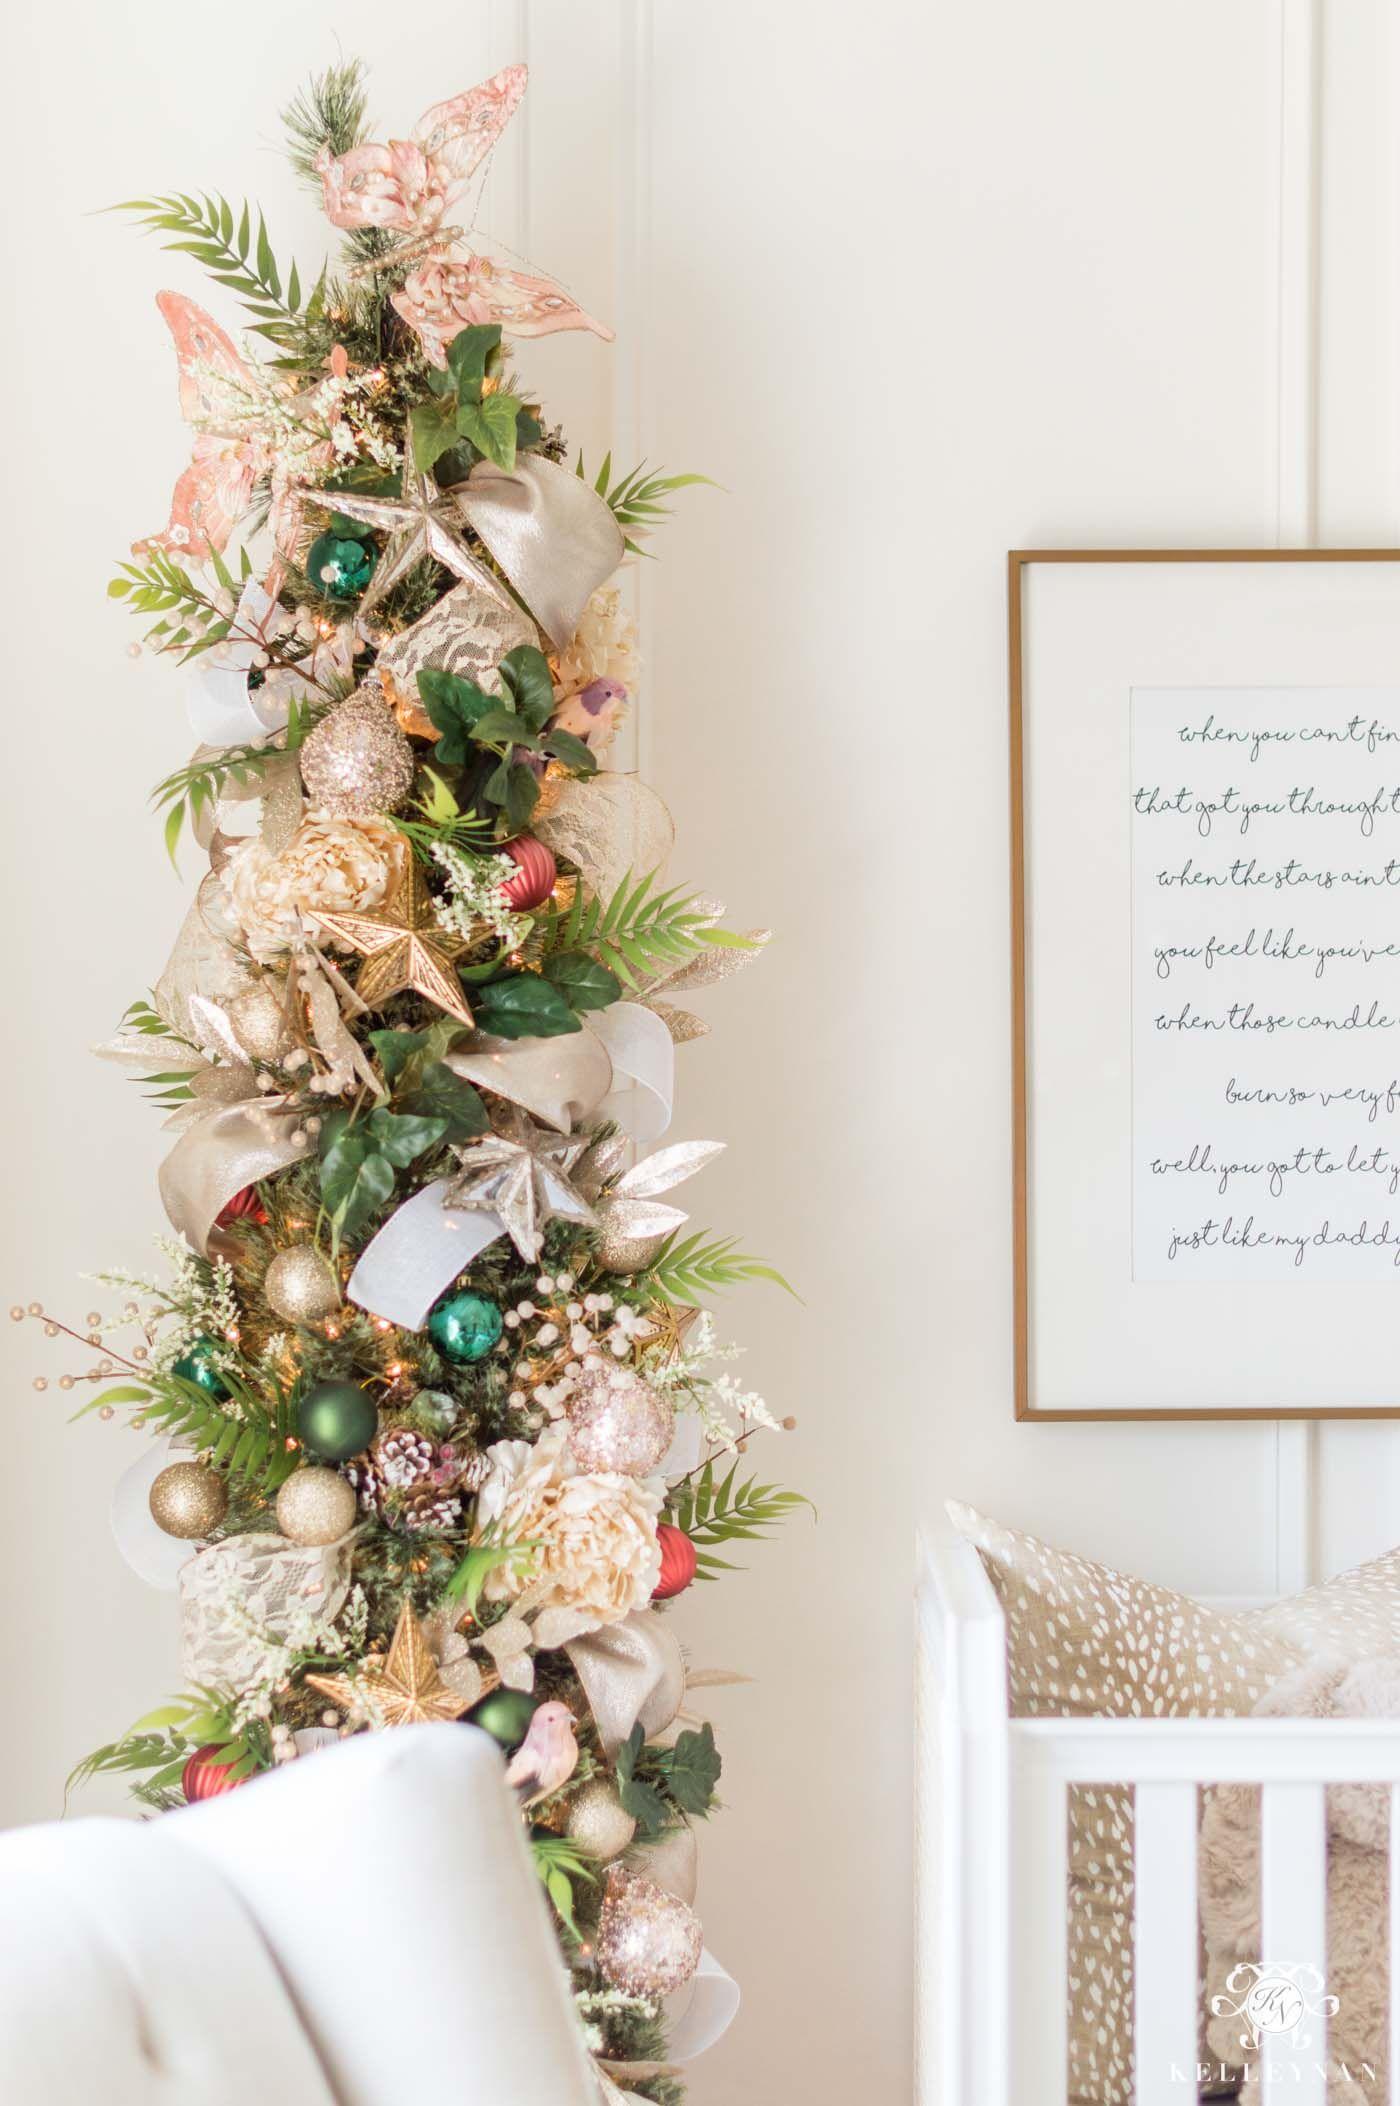 Nursery Christmas Decorations Whimsical Bedroom Ideas Kelley Nan White Christmas Ornaments Whimsical Bedroom Christmas Decorations